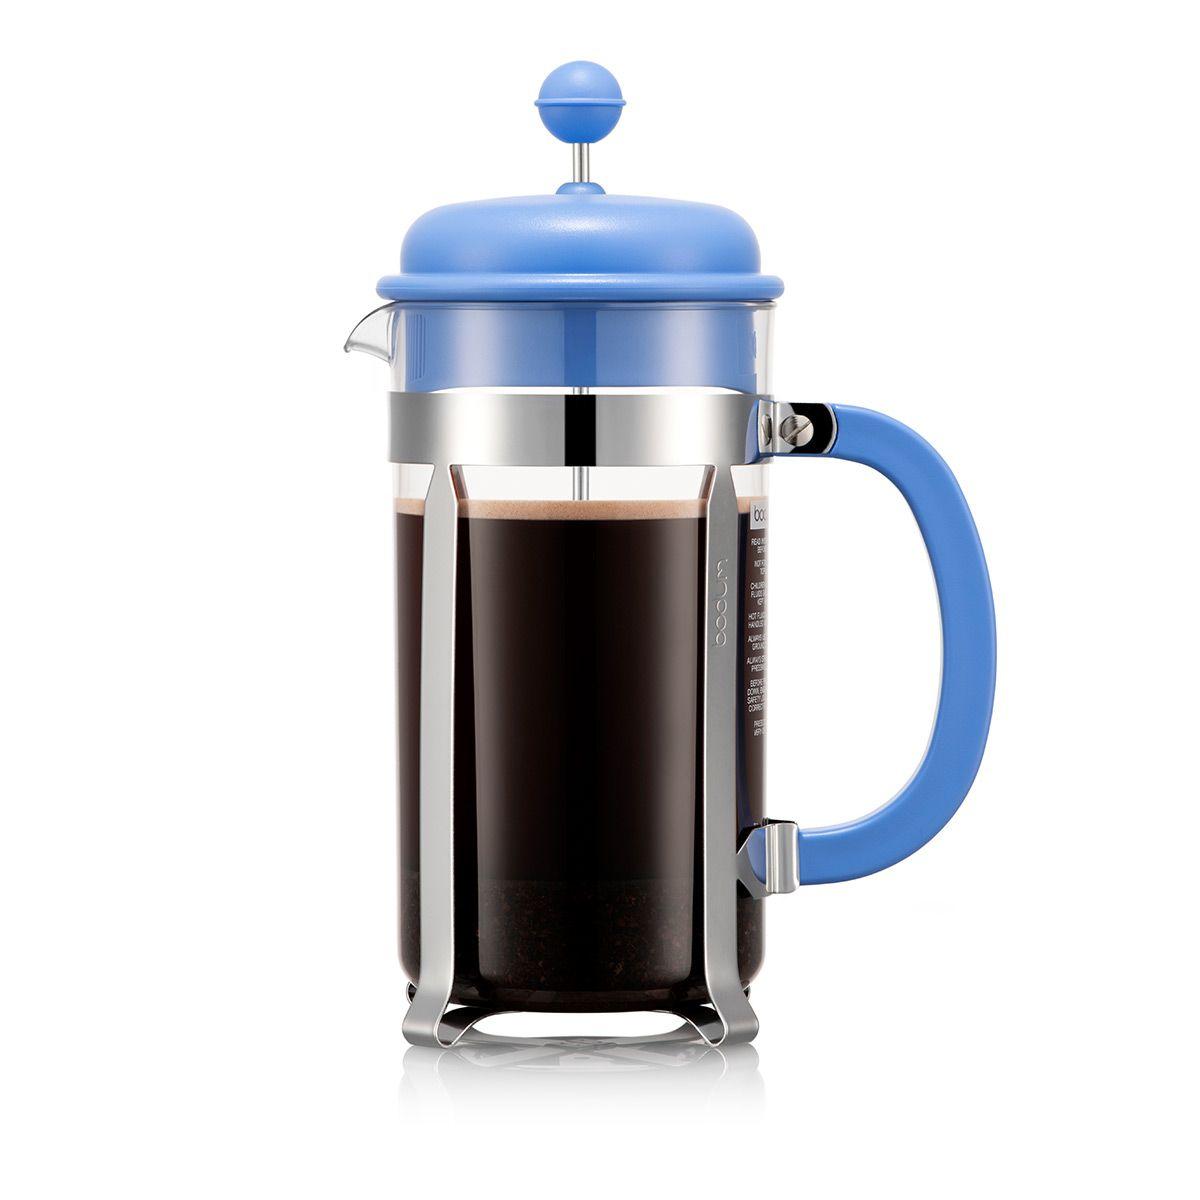 French Press Coffee Maker CAFFETTIERA Bodum